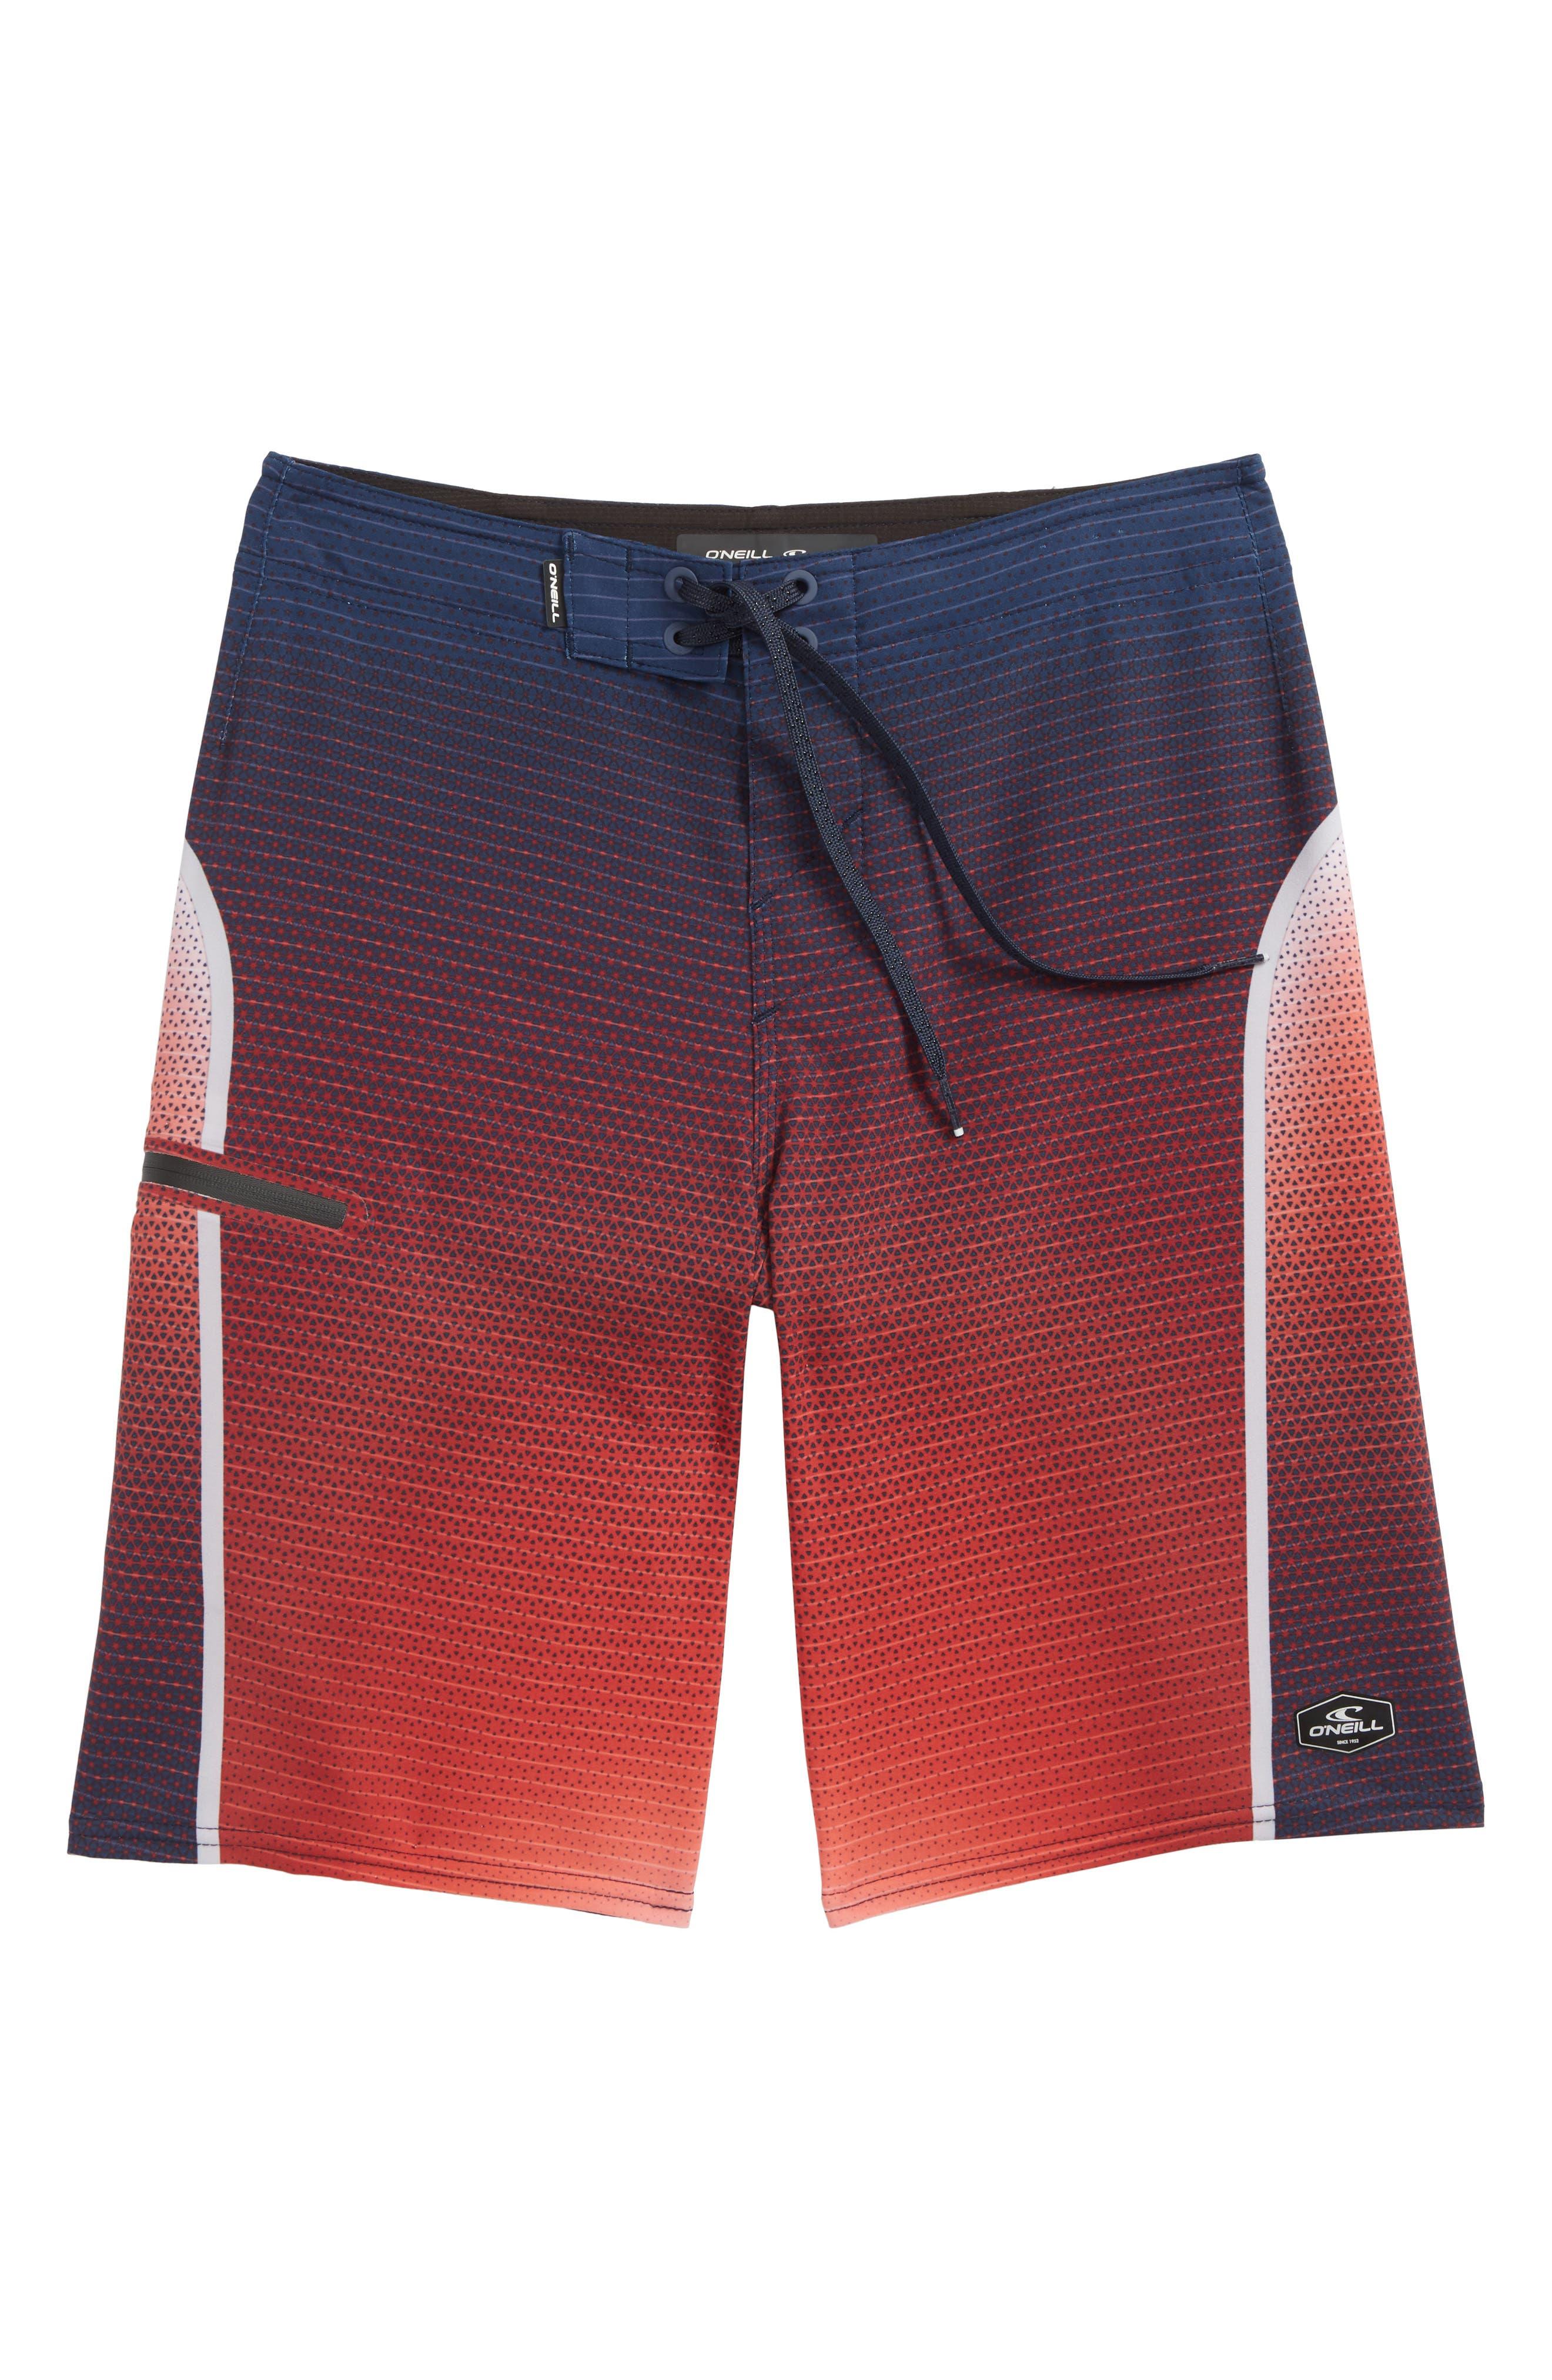 Hyperfreak Prizma Board Shorts,                             Main thumbnail 1, color,                             Red